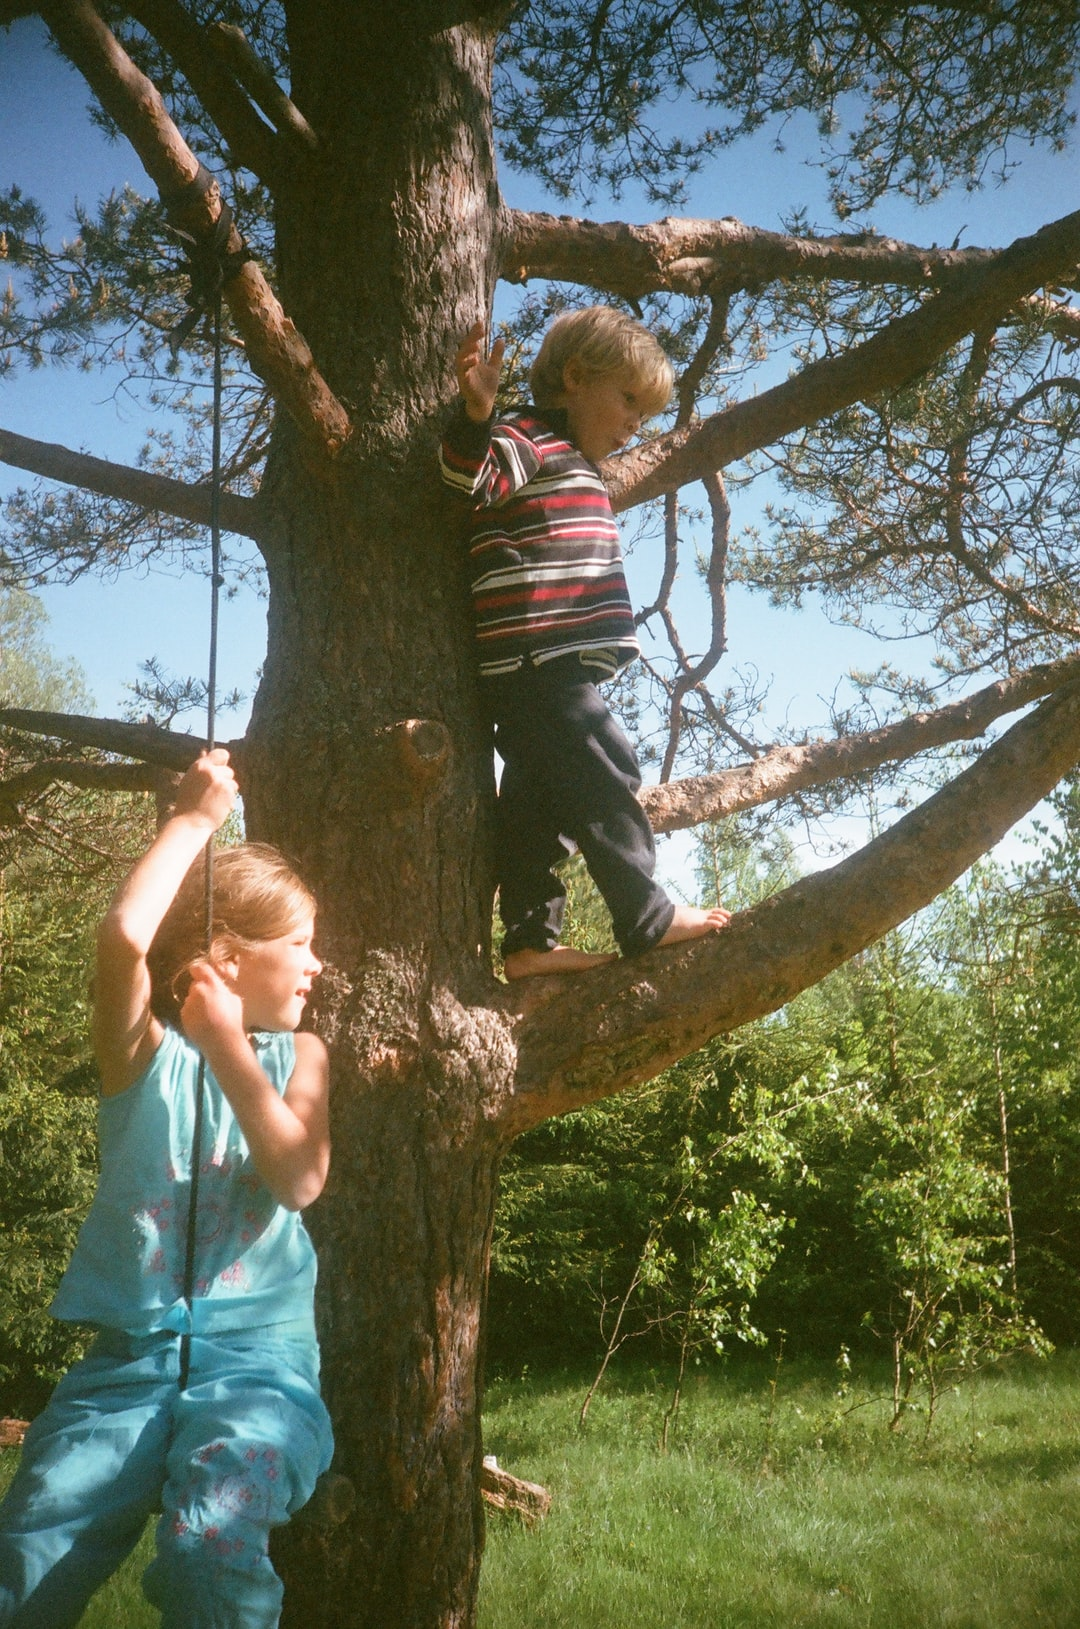 Kids spending summer on a pine tree